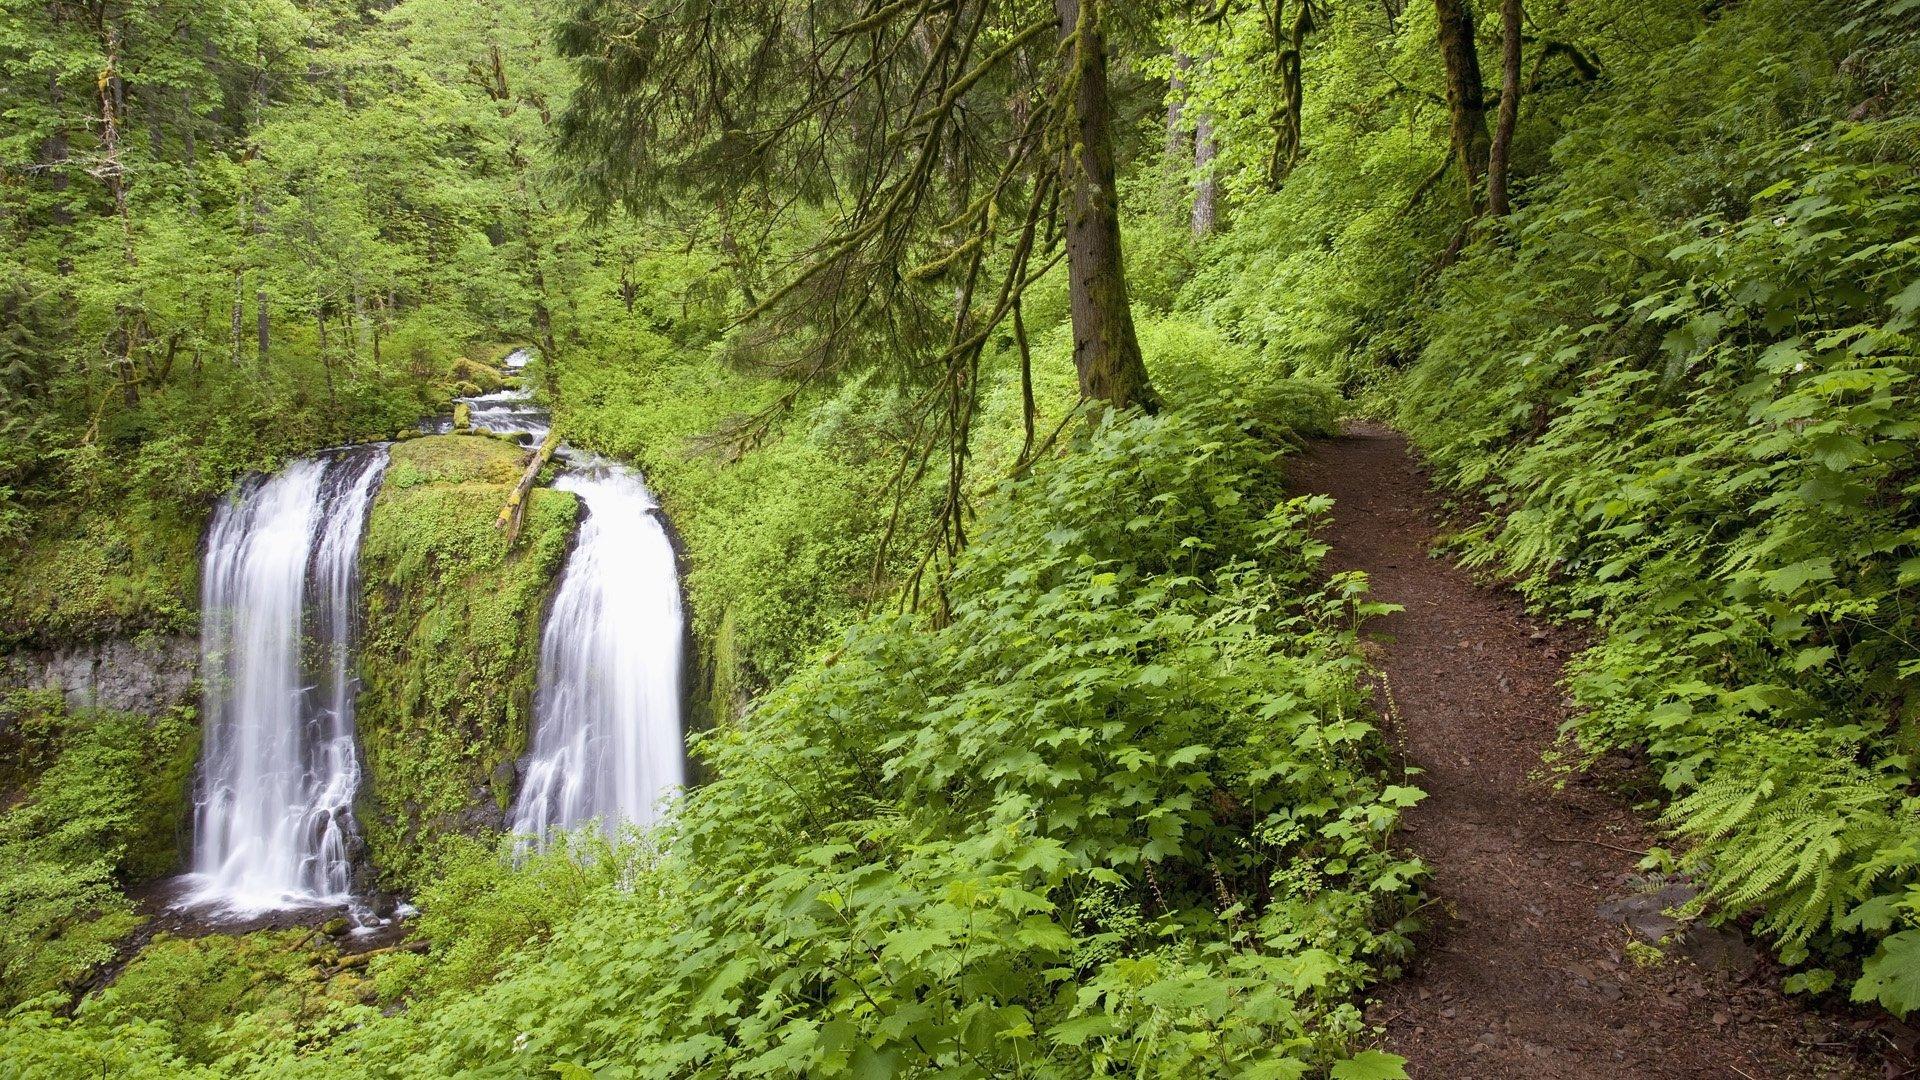 National Geographic Fall Wallpaper Upper Mccord Creek Falls Columbia River Gorge Oregon Usa